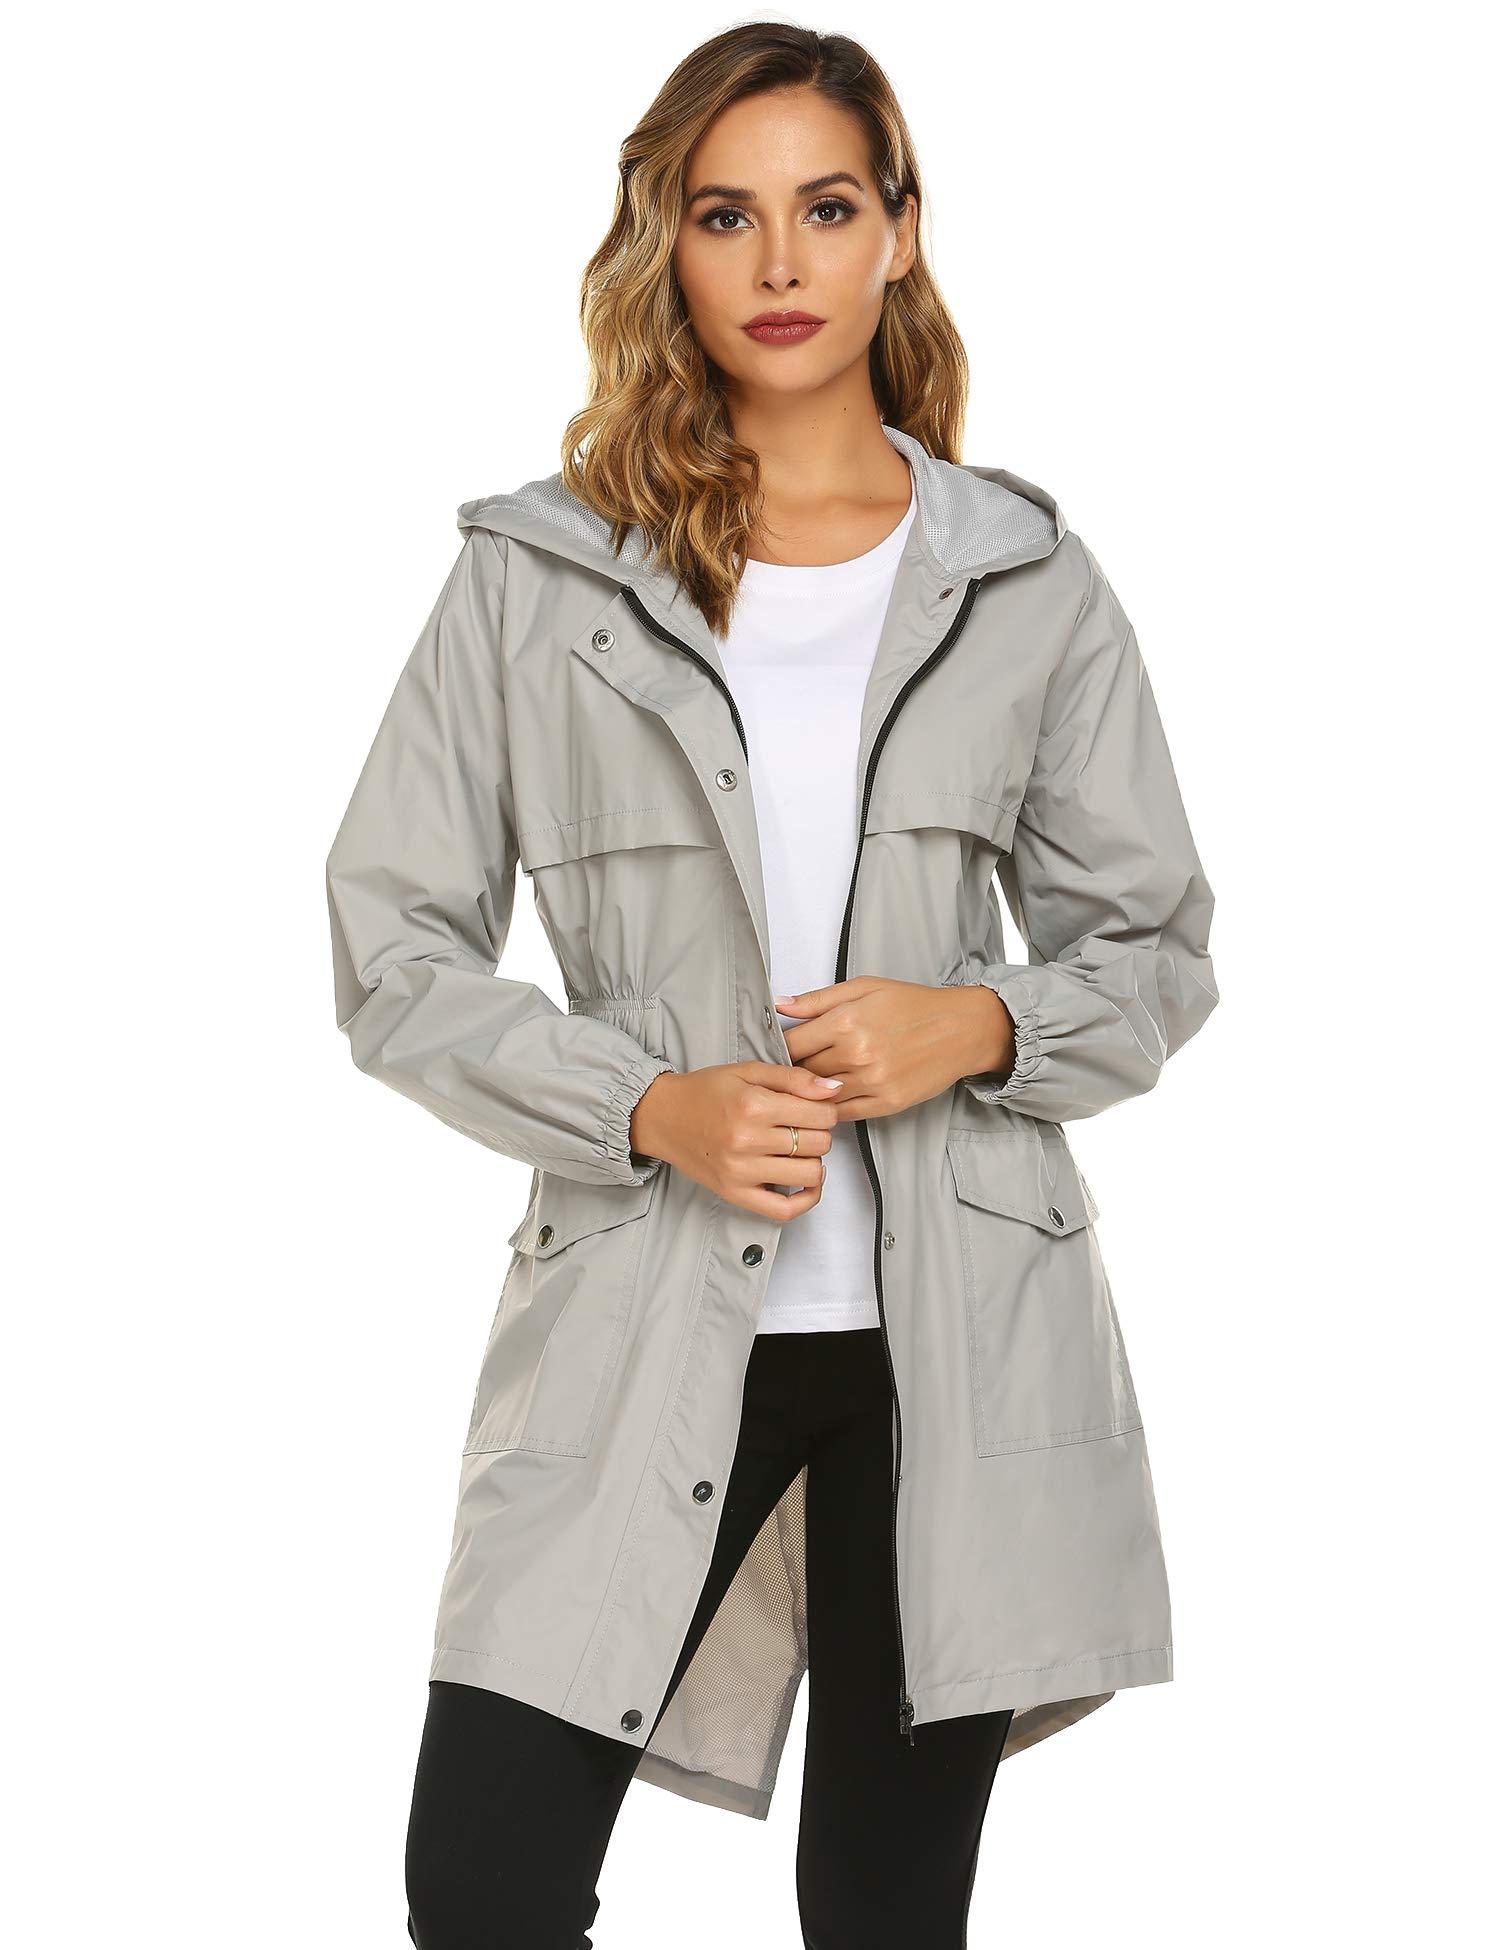 Avoogue Rain Jacket Womens Lightweight Long Raincoat Waterproof Packable Active Hiking Jacket Grey by Avoogue